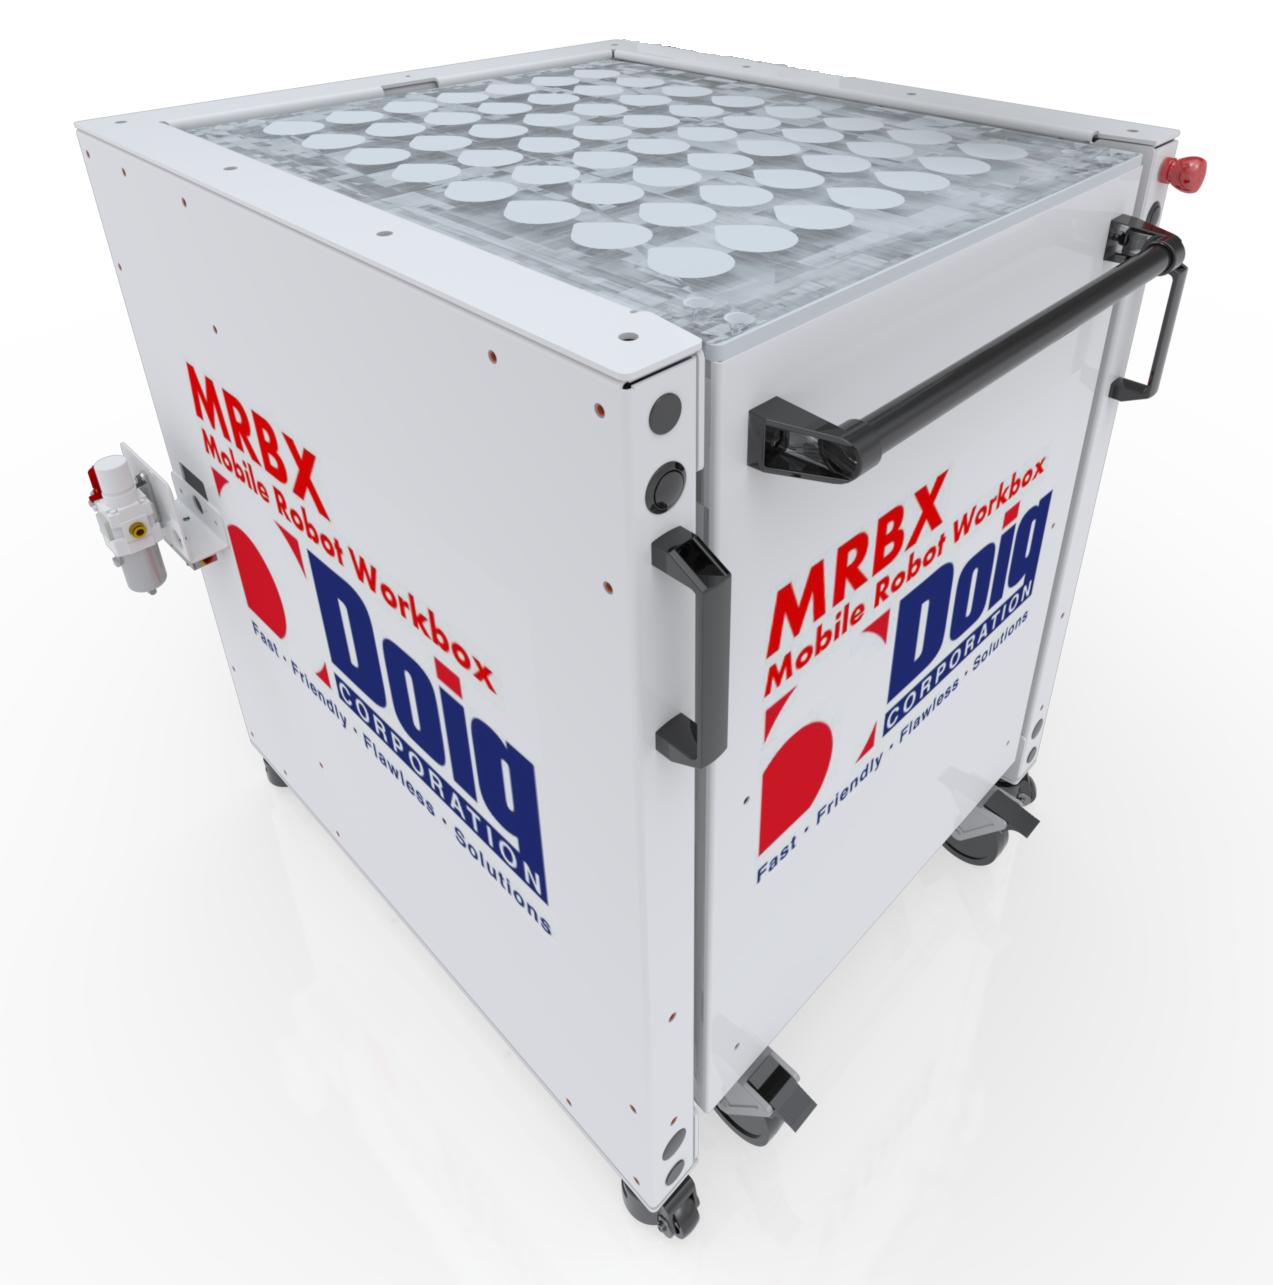 DOIG MRBX Mobile Robot Workbox | CNC Machine Tending